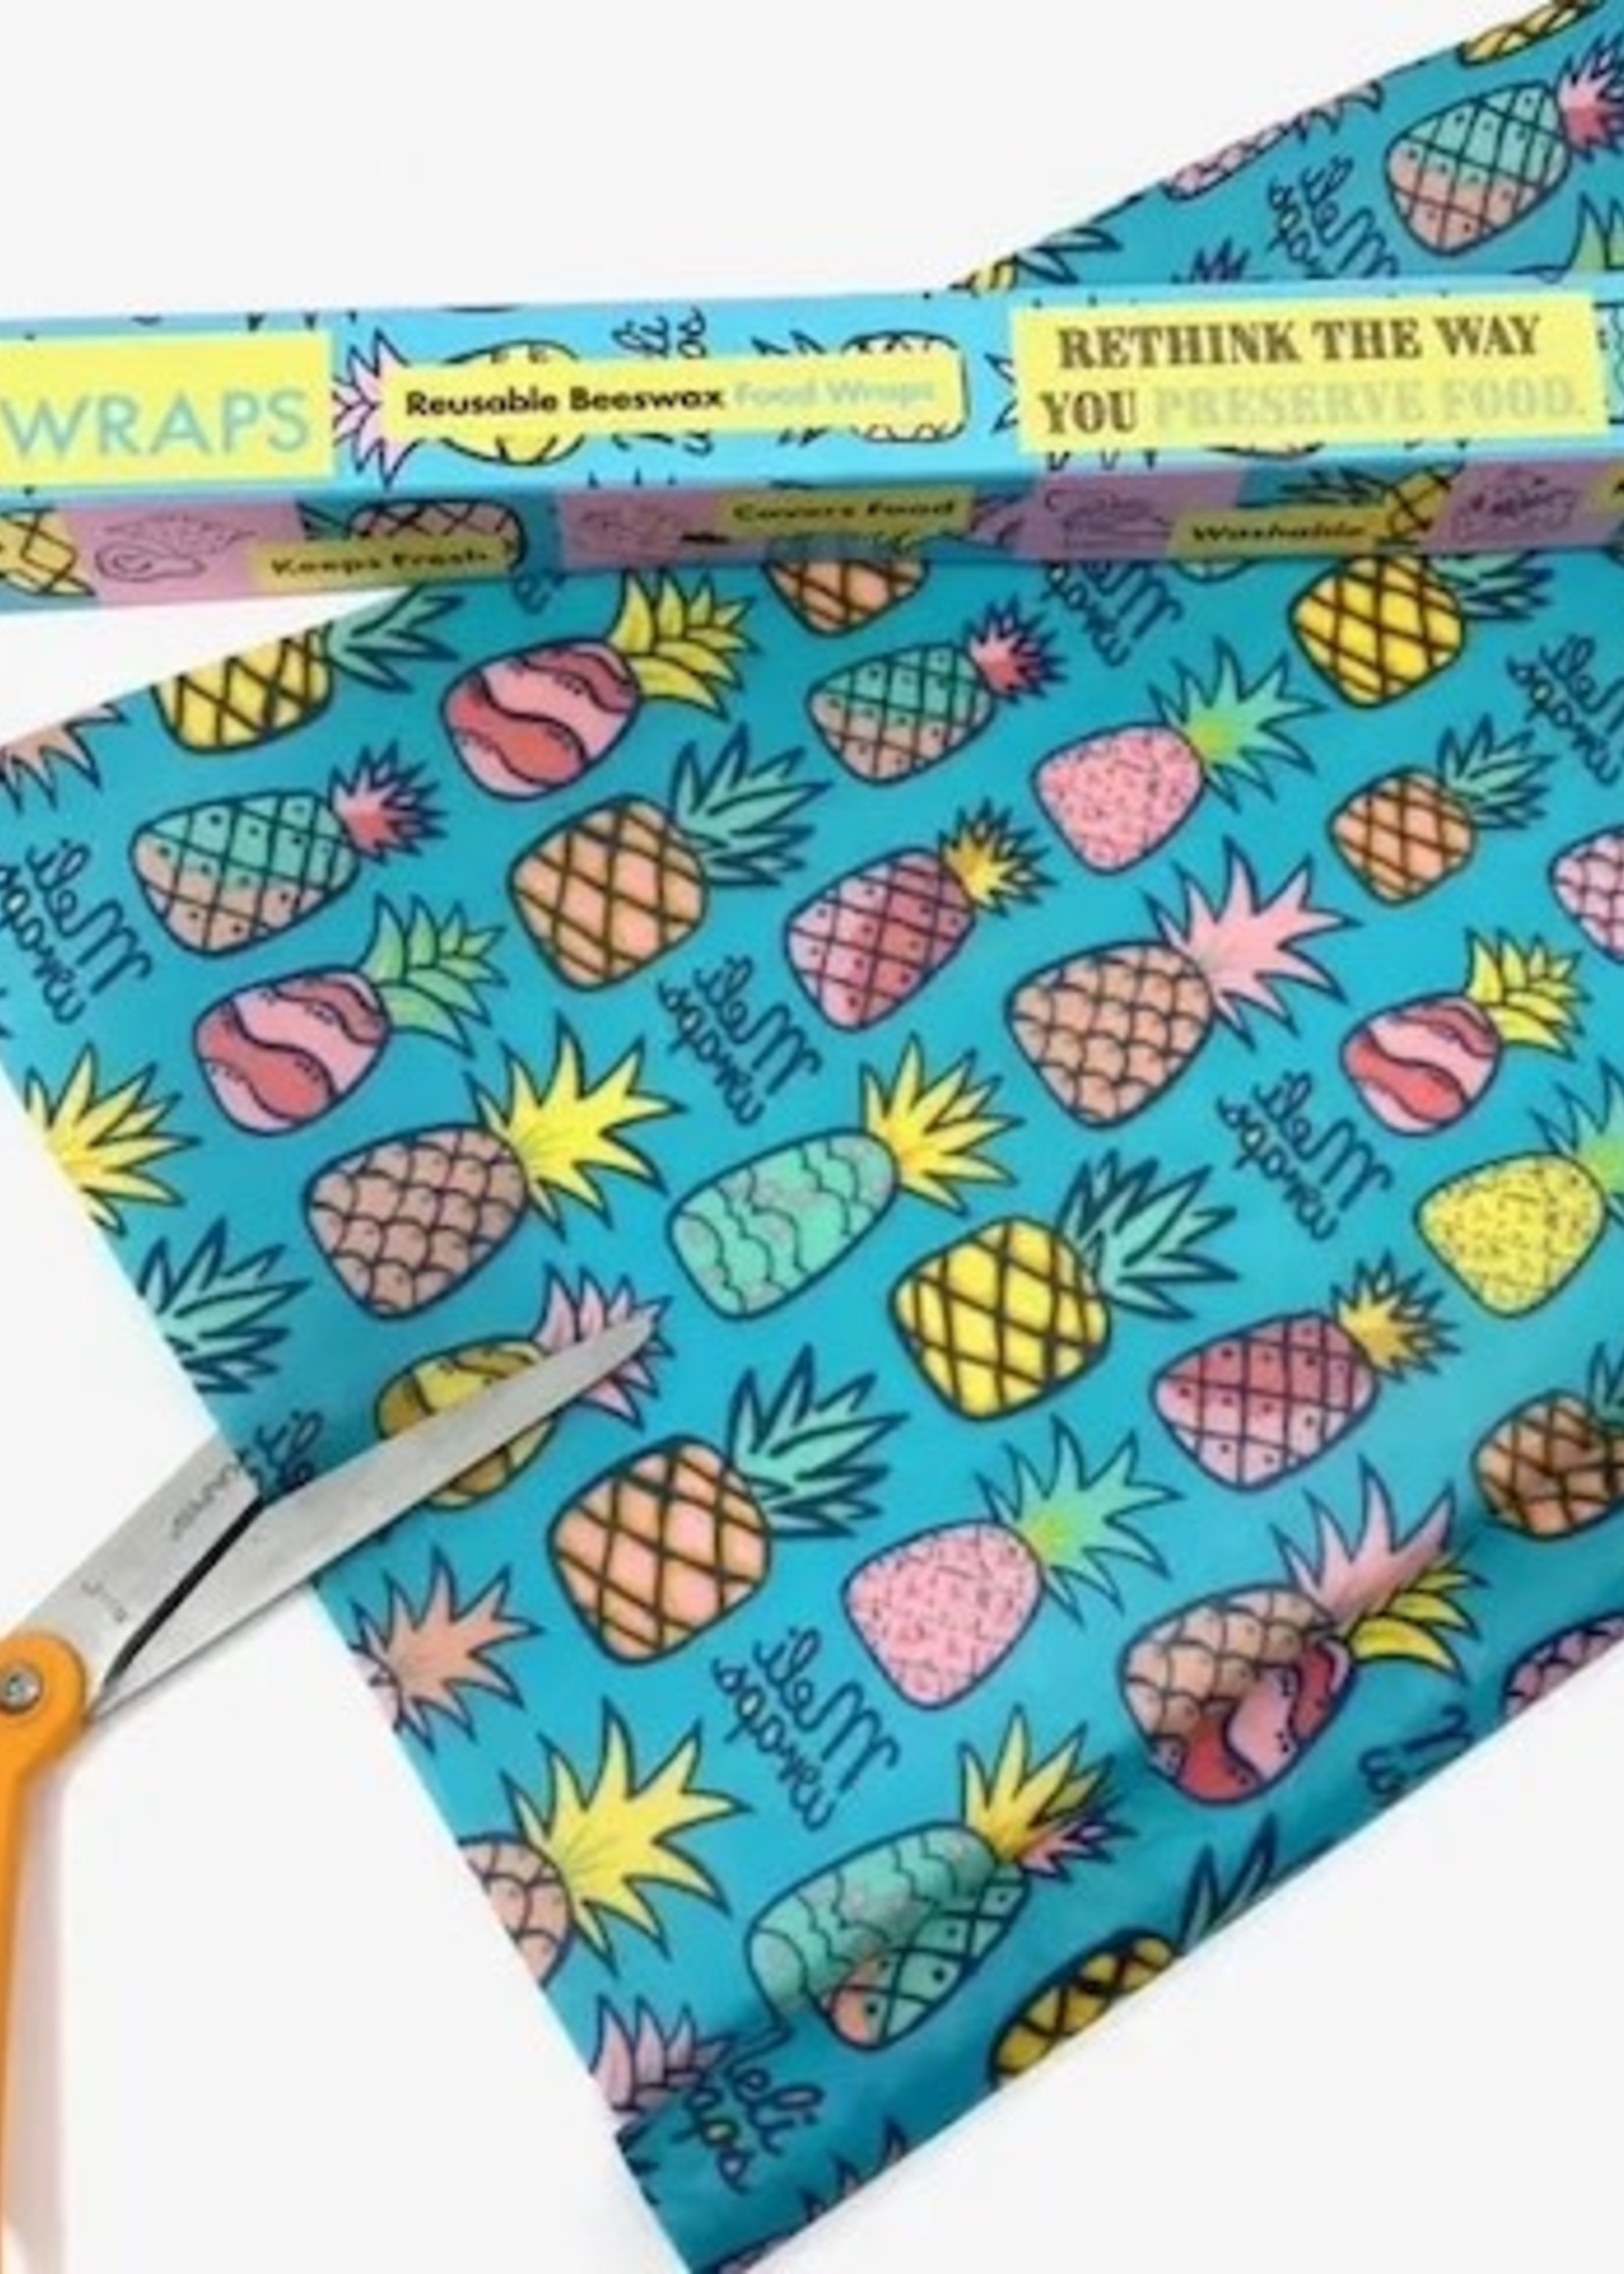 Meli Wraps Beeswax Wrap Bulk Roll